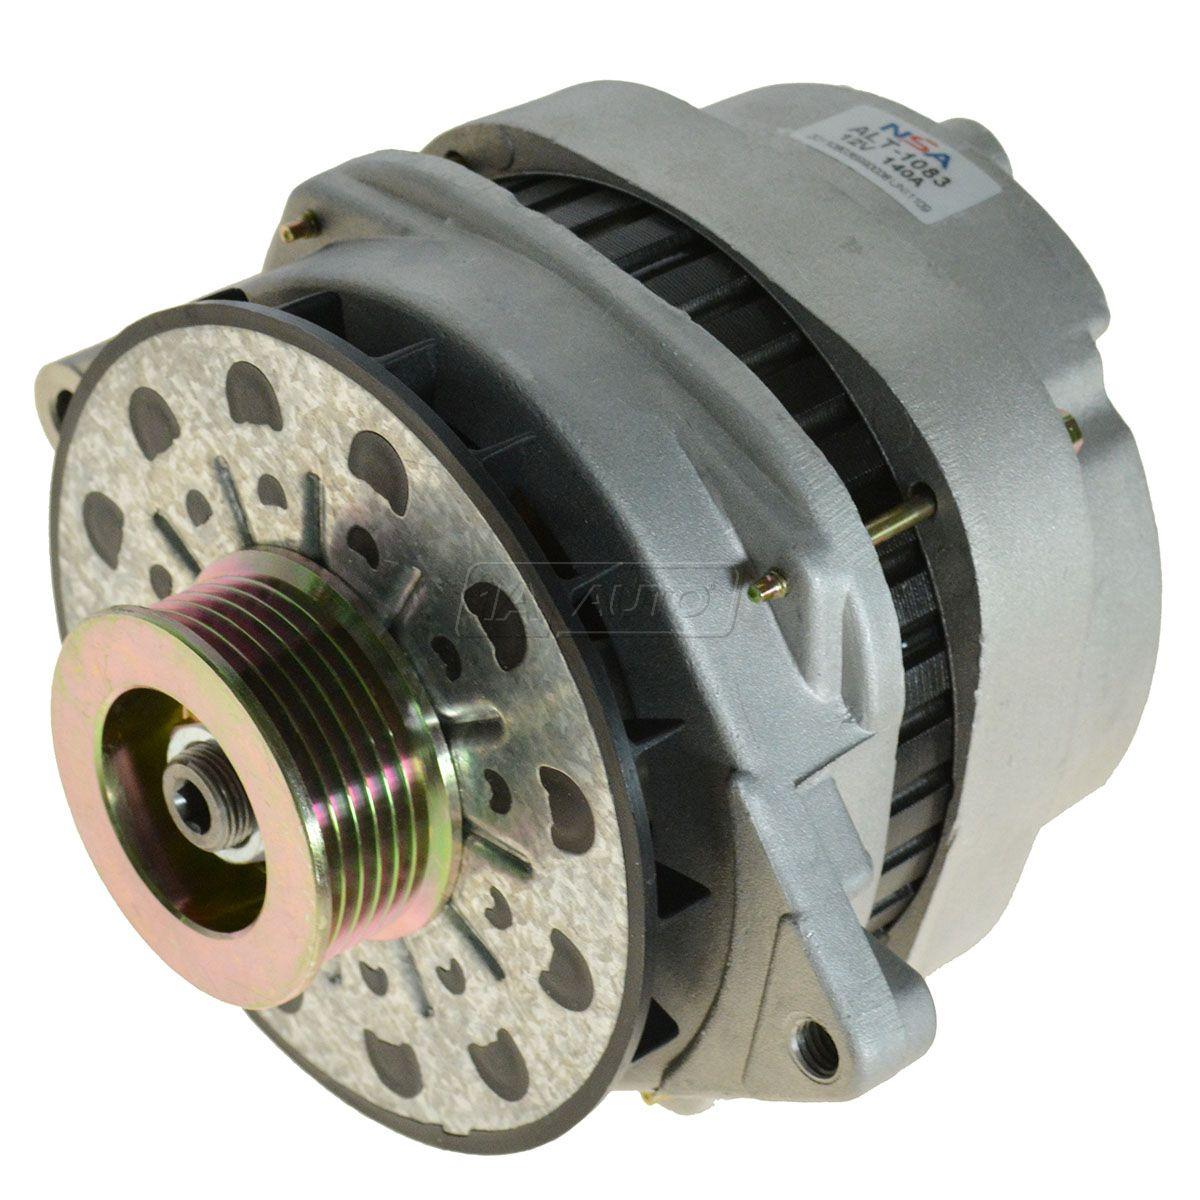 1997 chevy s10 alternator wiring diagram electrical ppt 97 cadillac eldorado fuse